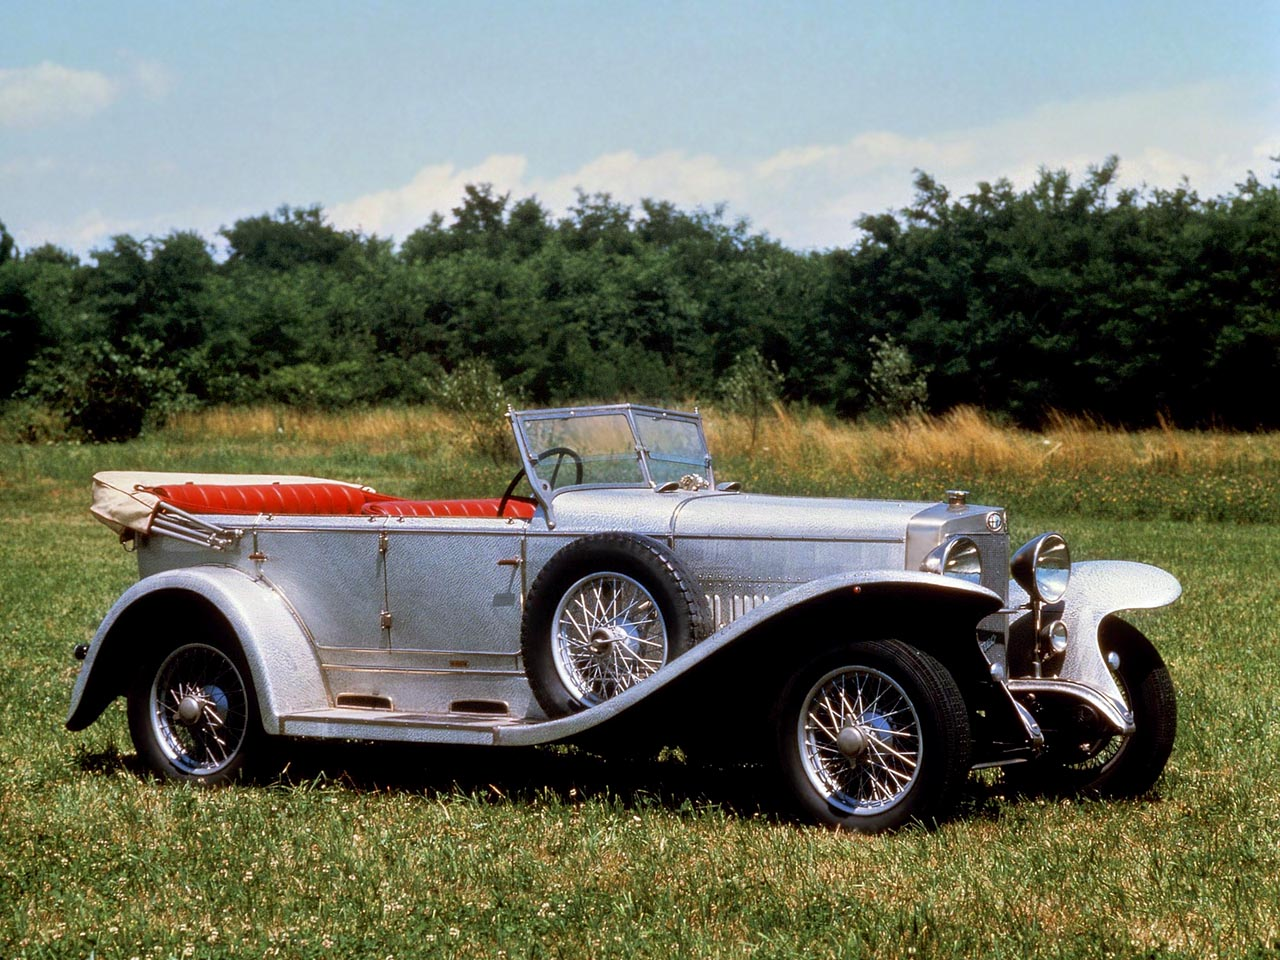 1925-Castagna-Alfa-Romeo-RLSS-04